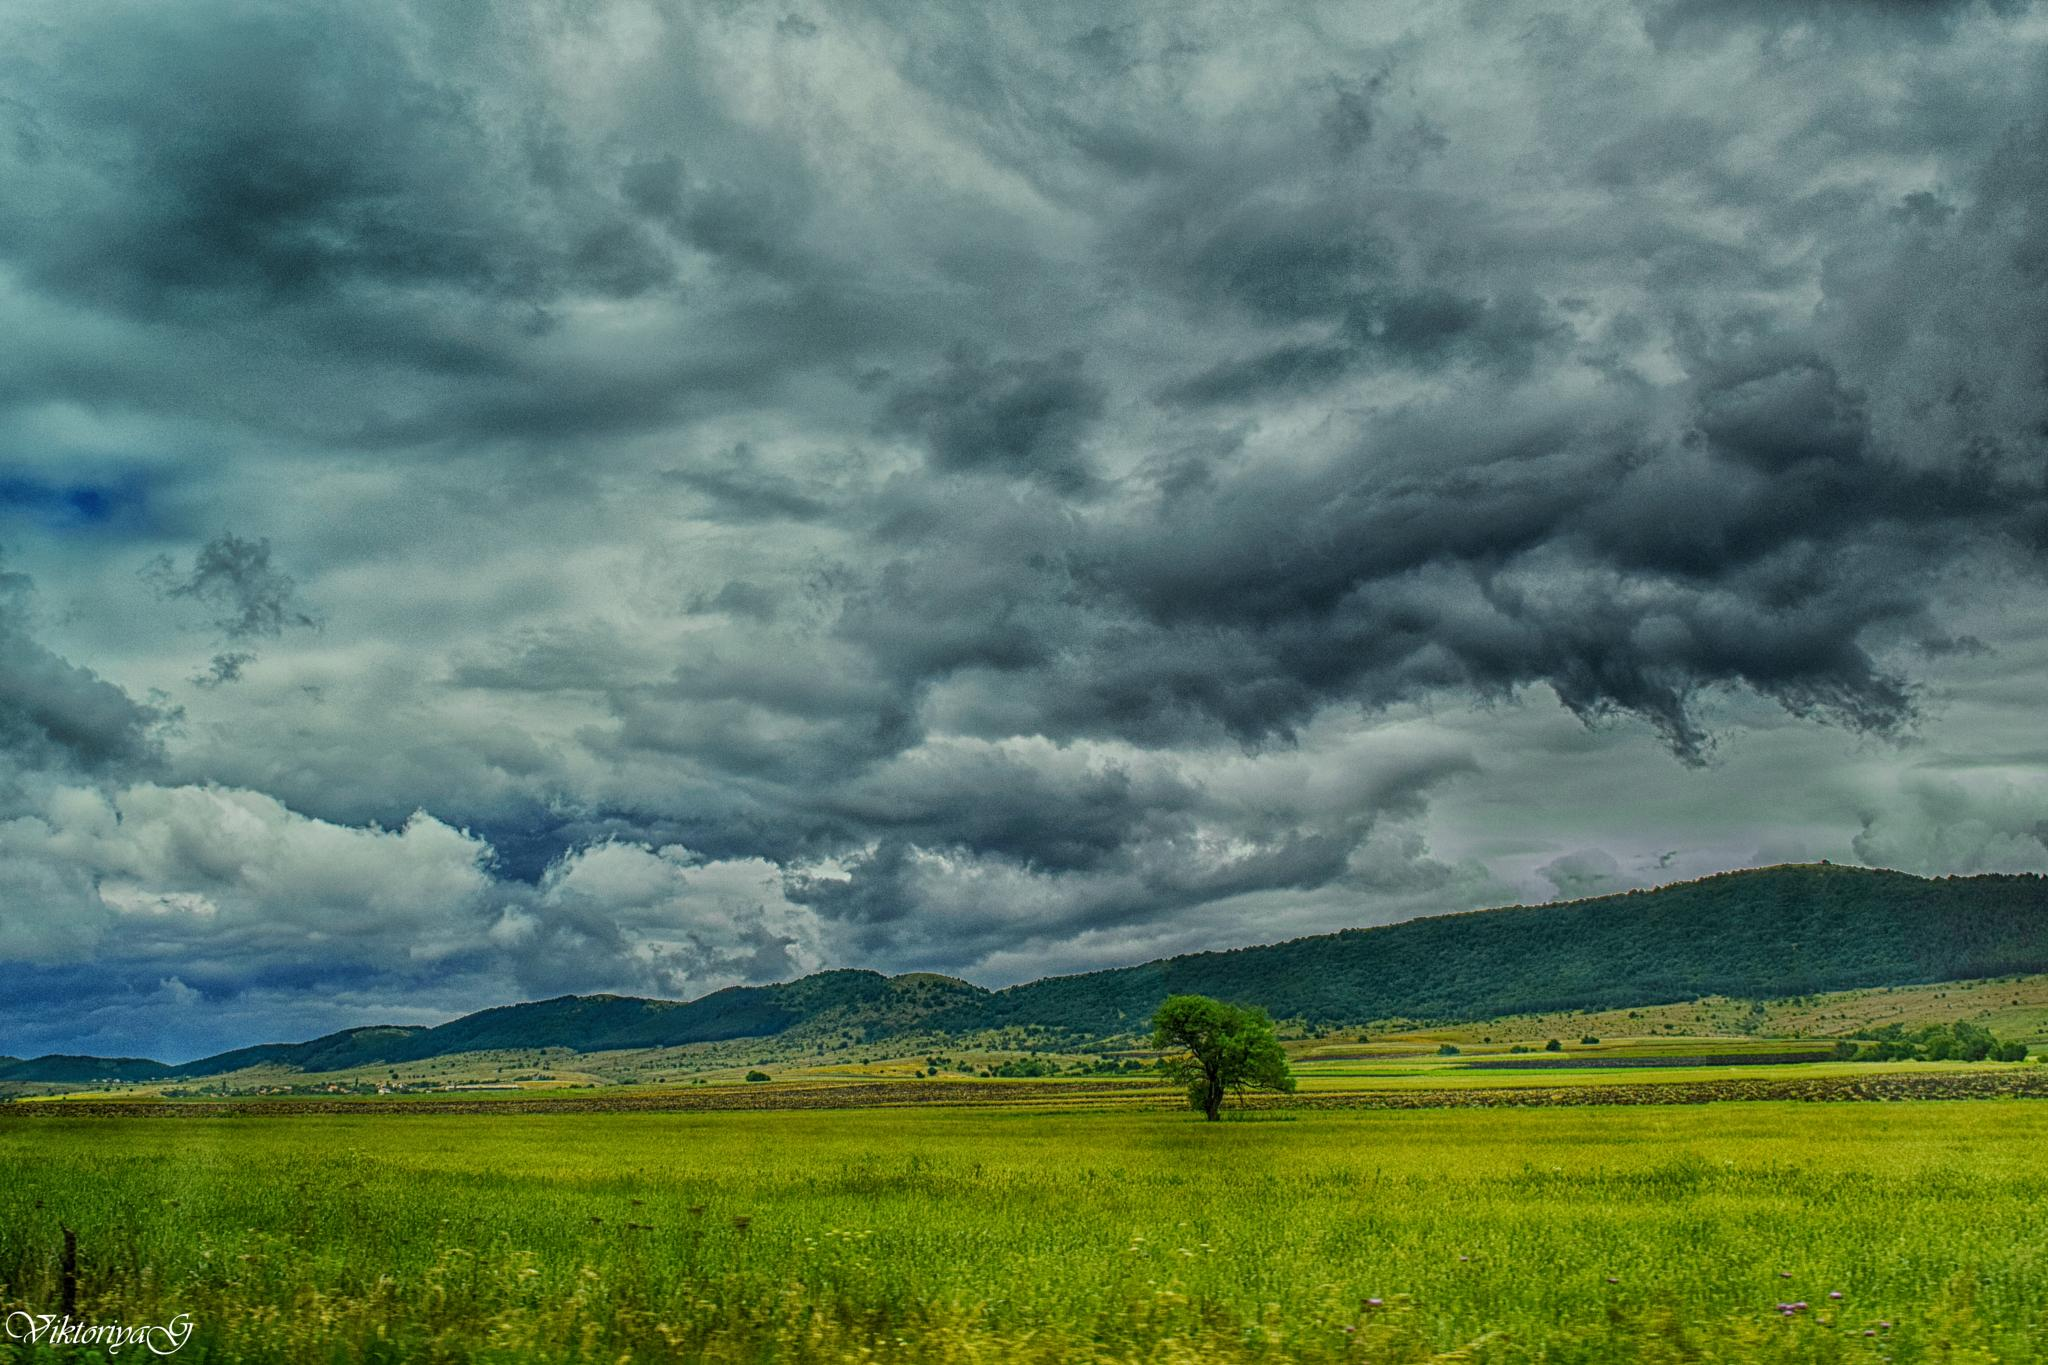 Waiting for storm by Viktoriya Georgieva